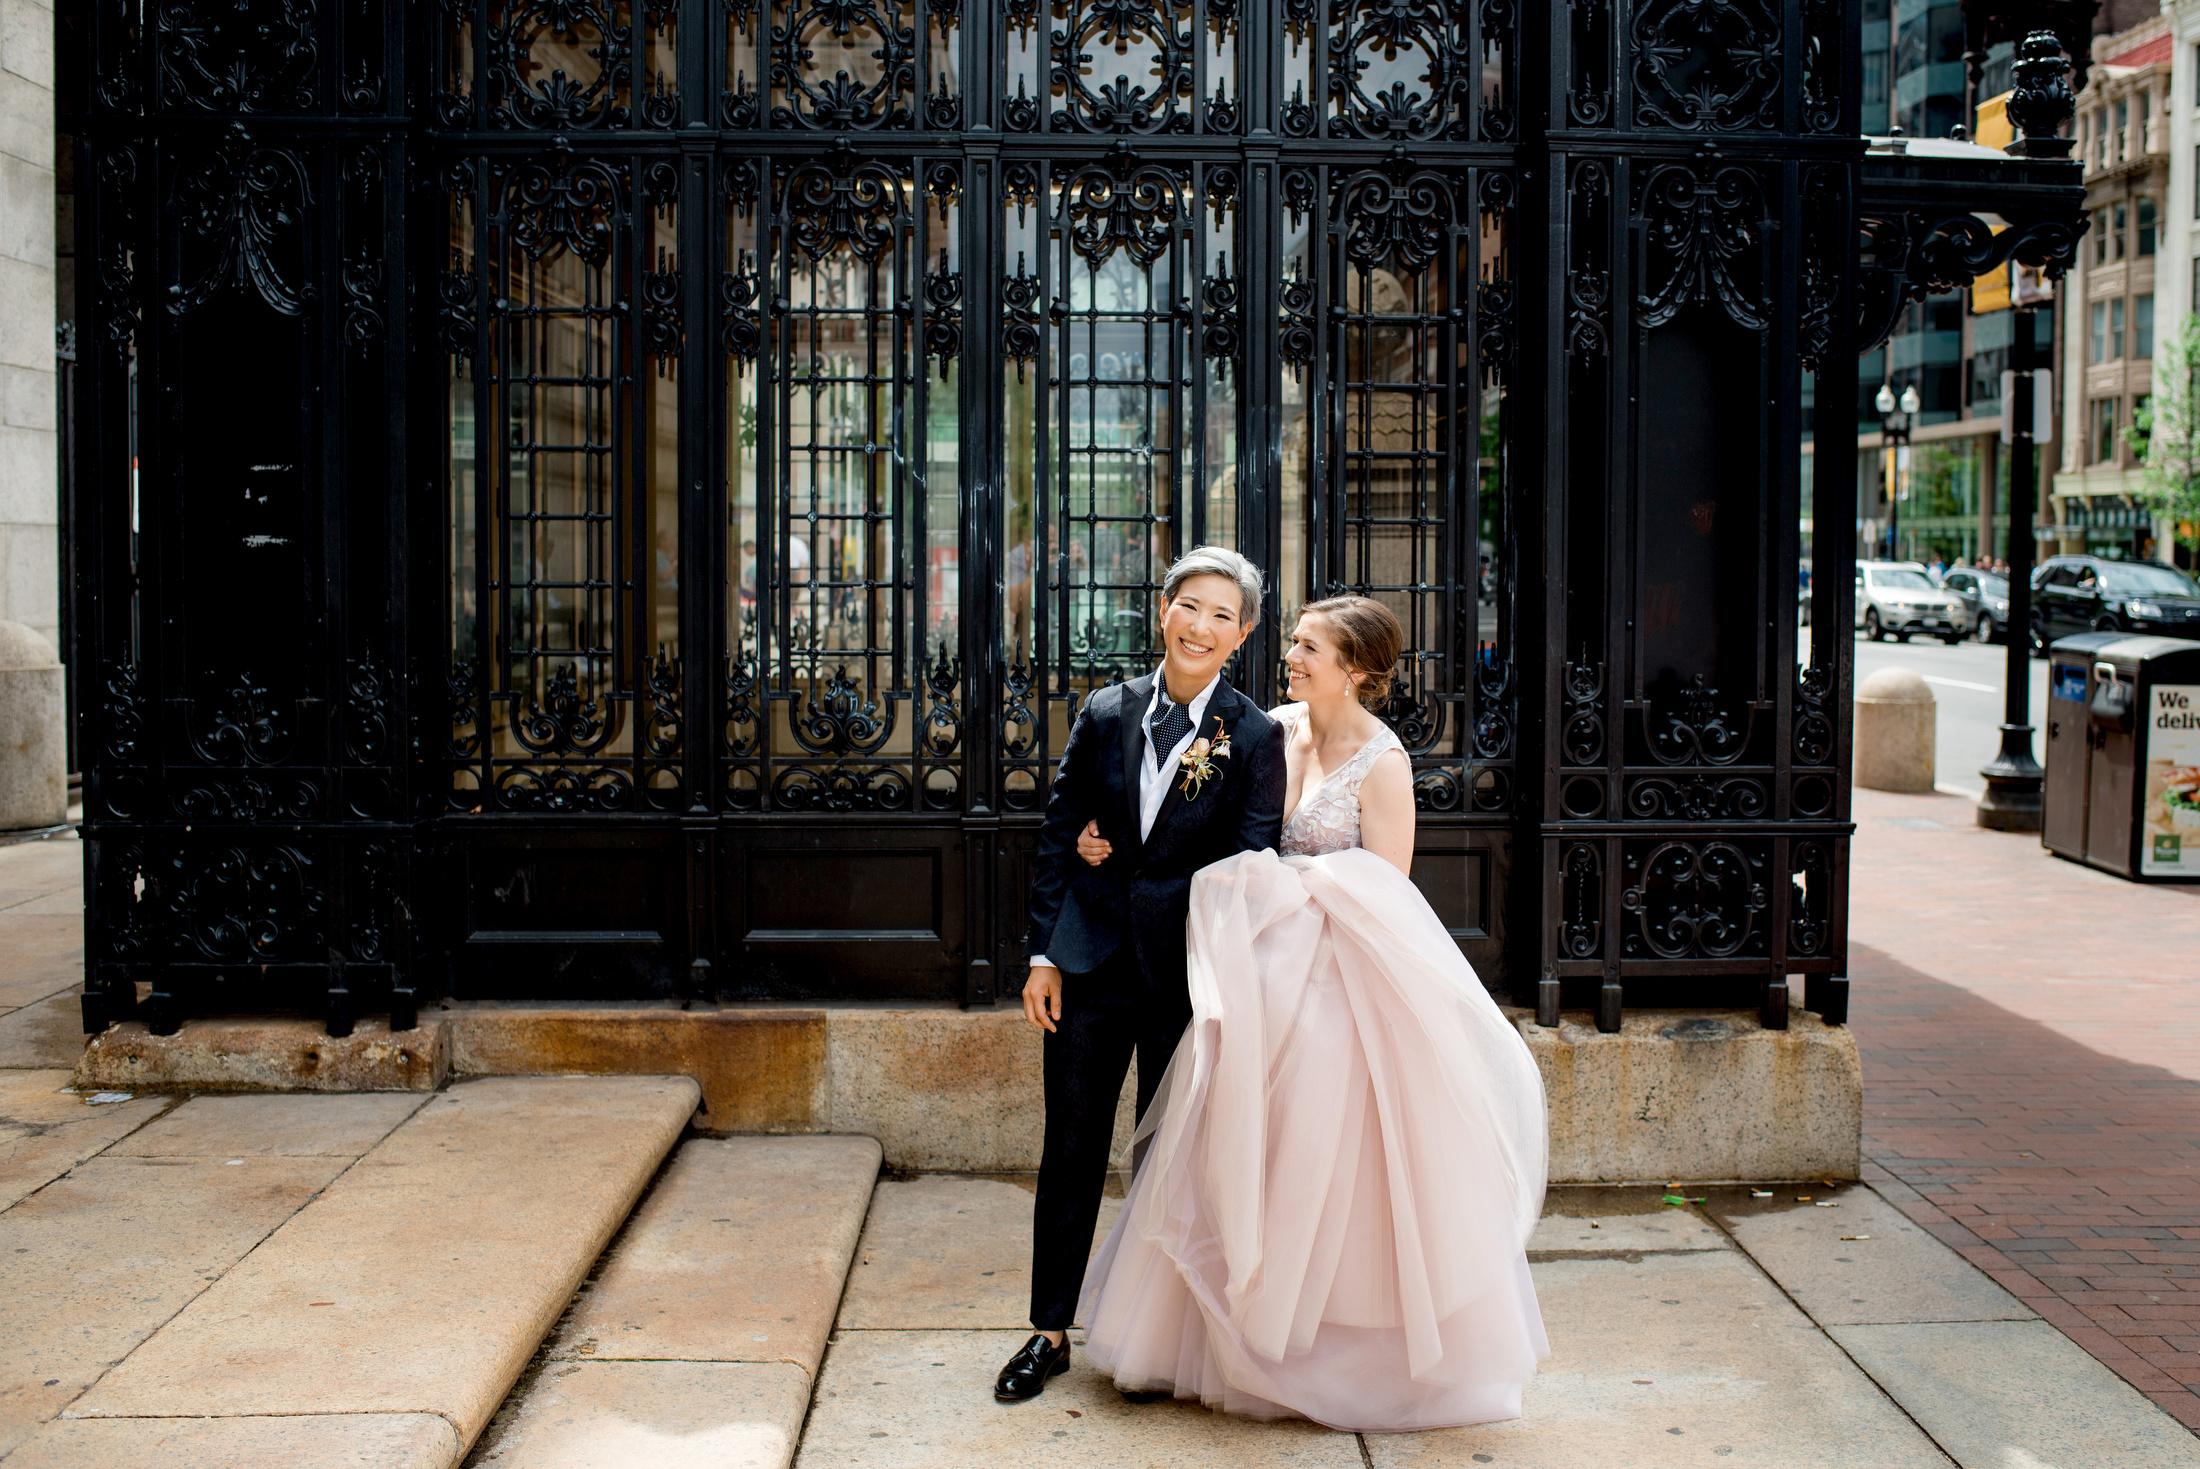 boston public library same-sex wedding portraits